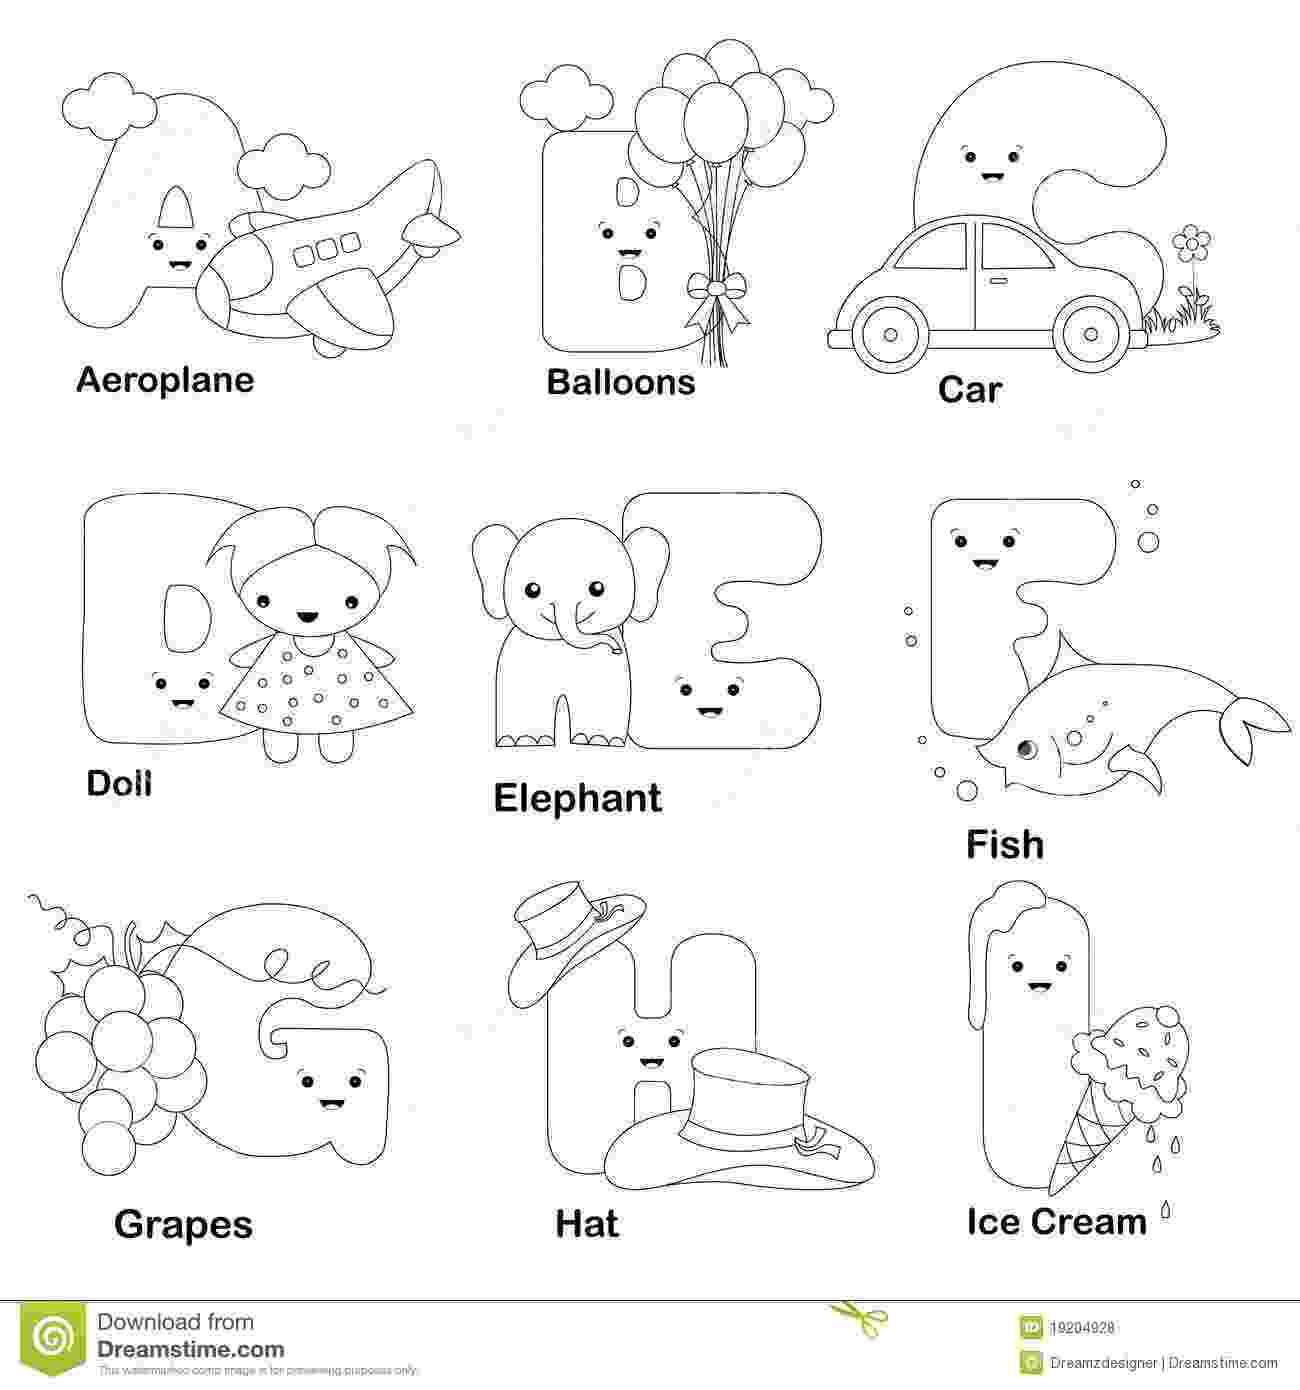 childrens colouring pages alphabet alphabet doodle alphabet coloring pages for kids to alphabet pages childrens colouring